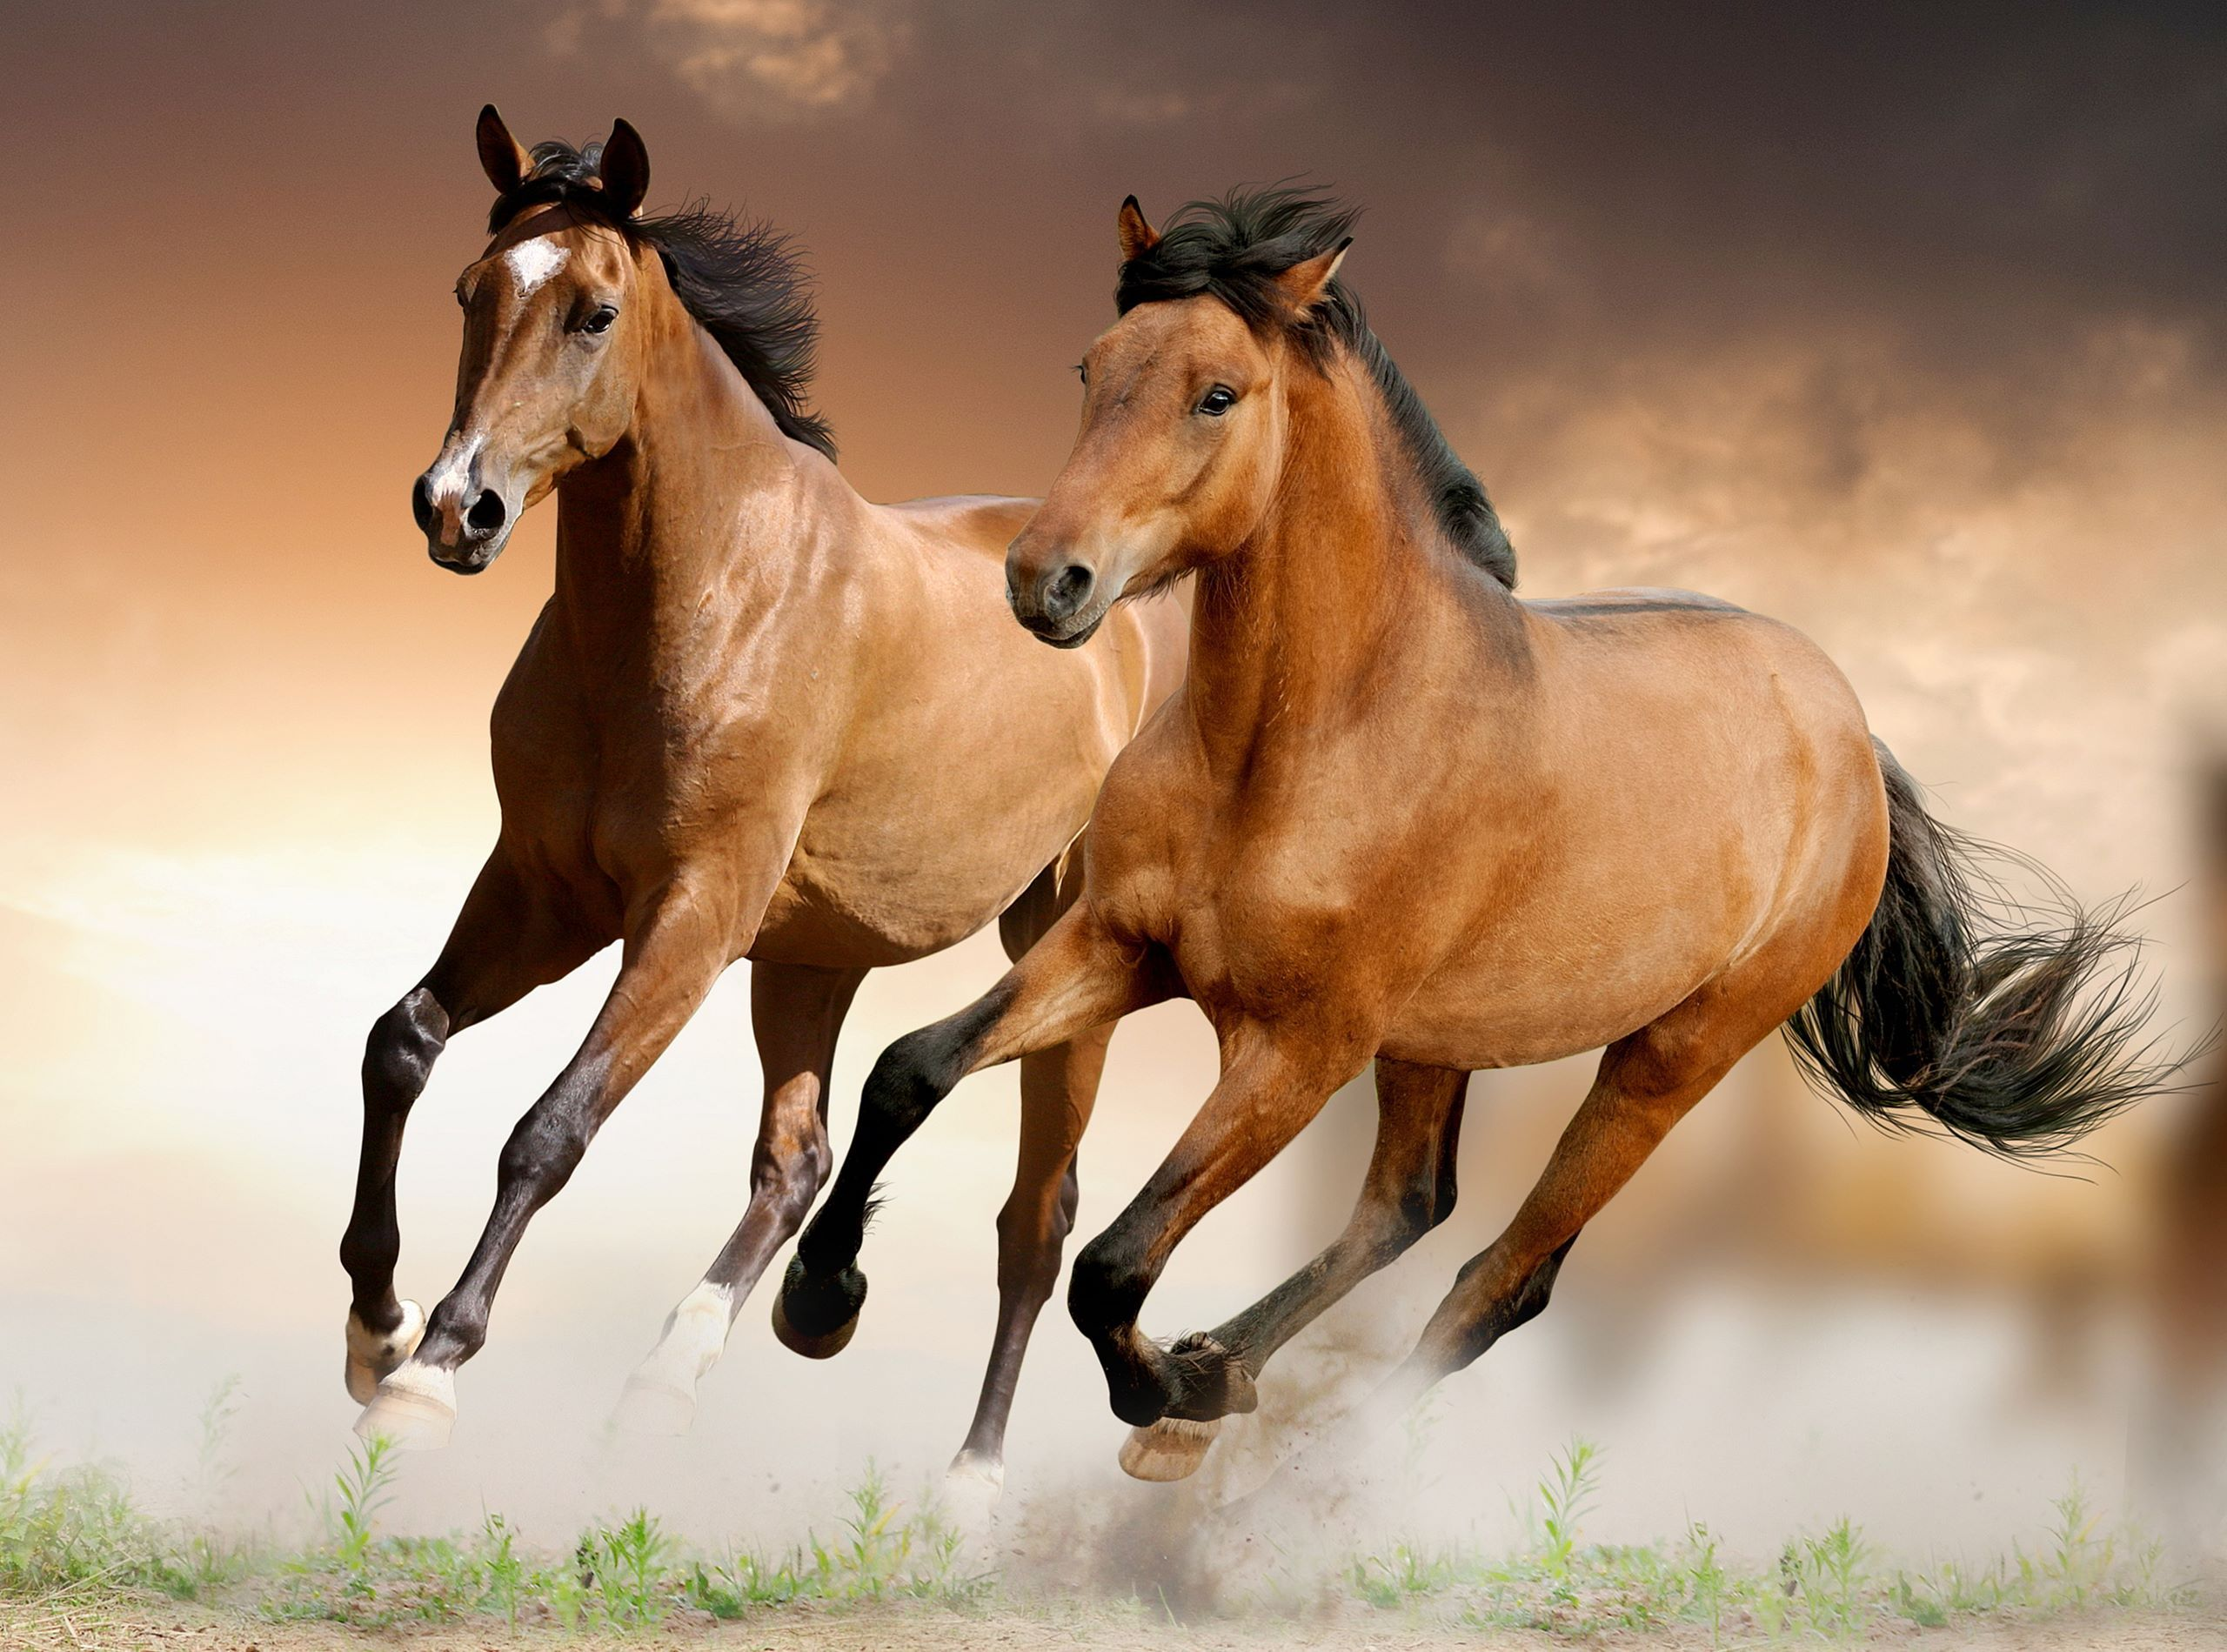 Brown Horses Running Wallpaper Horse Wallpaper Beautiful Horses Horse Pictures